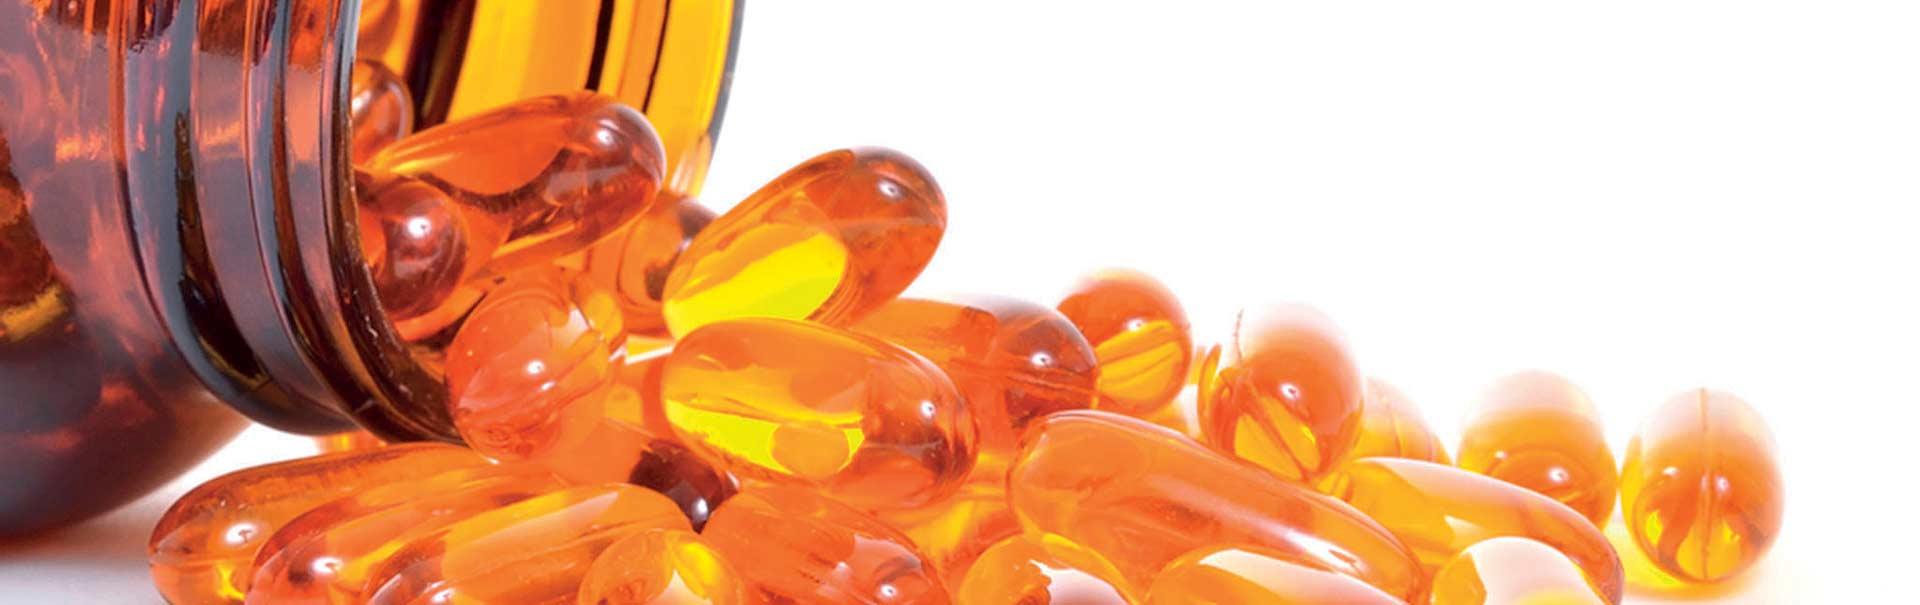 Vitamina D aumenta testosterona e rendimento desportivo?